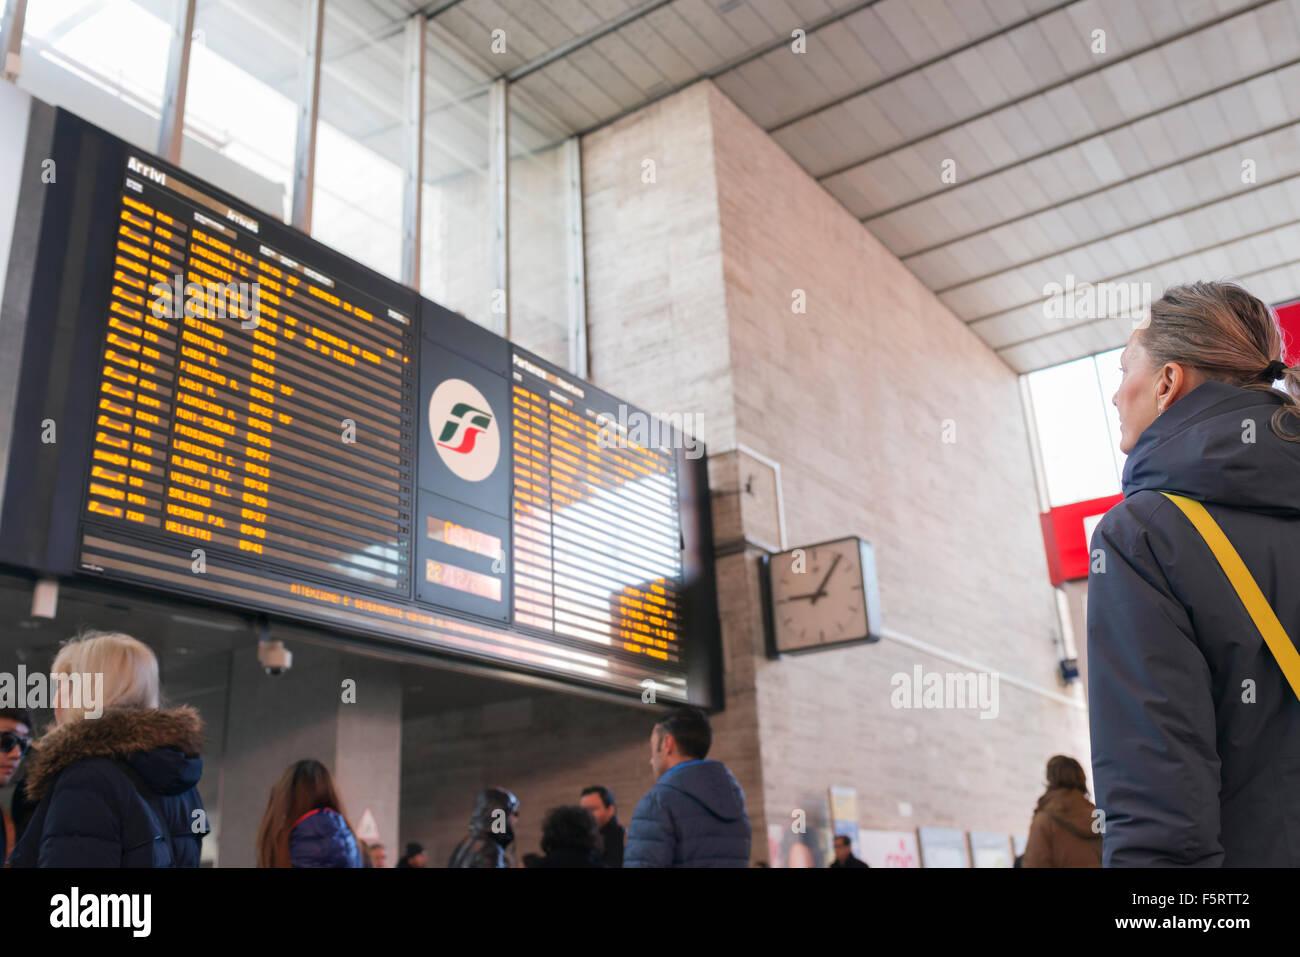 Italy, Lazio, Rome, Senior woman looking at arrival departure board - Stock Image